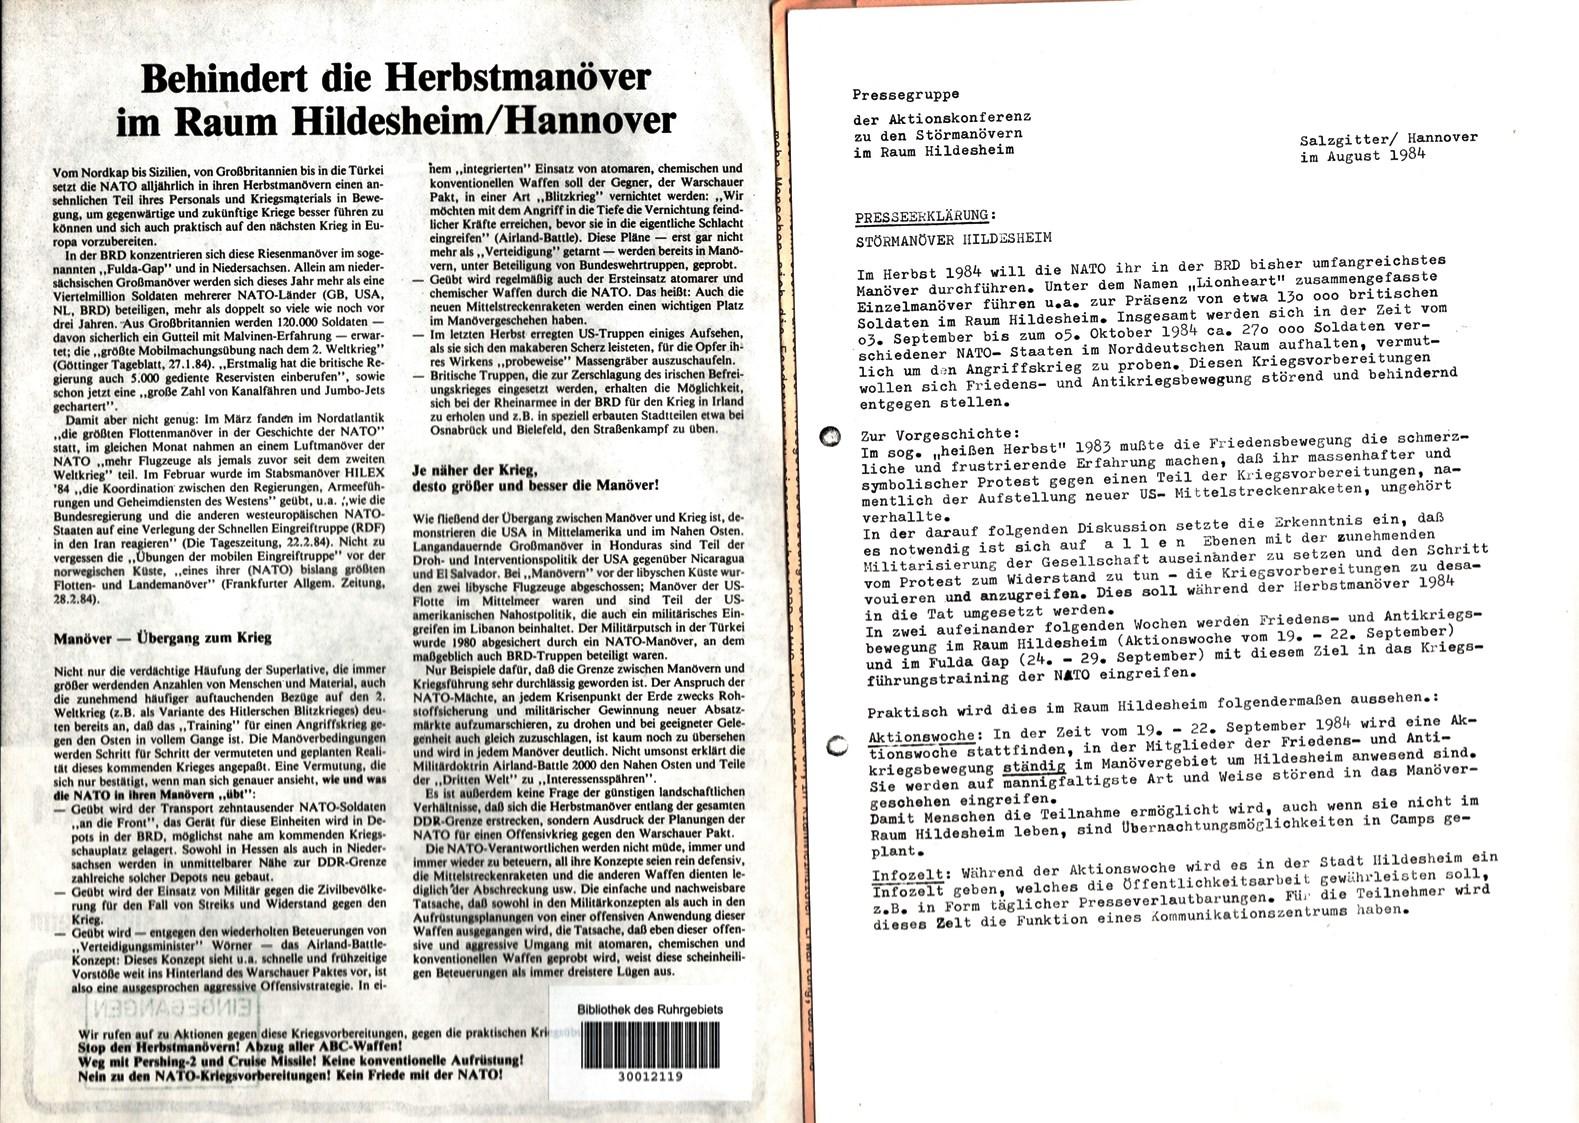 Hildesheim_1984_Manoeverbehinderung_002